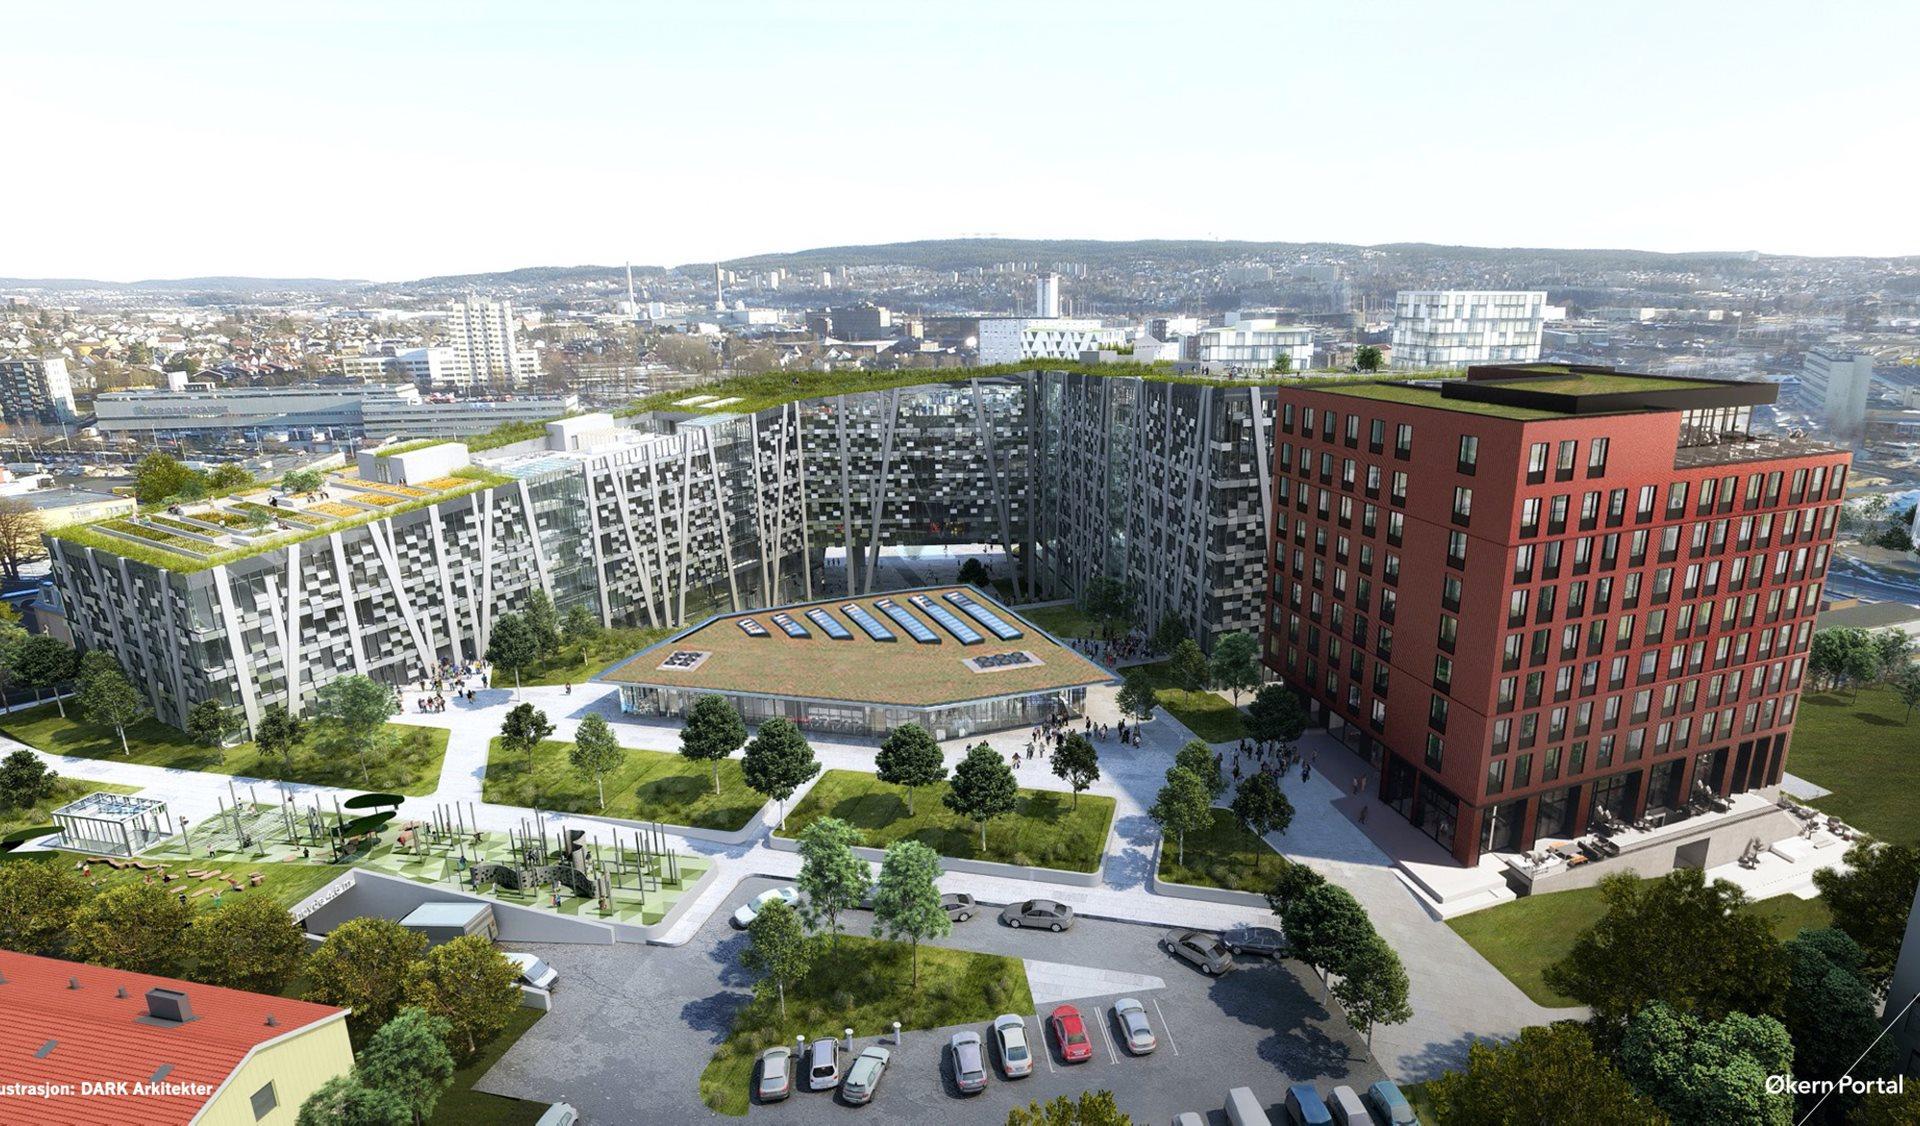 Project   Økern Portal